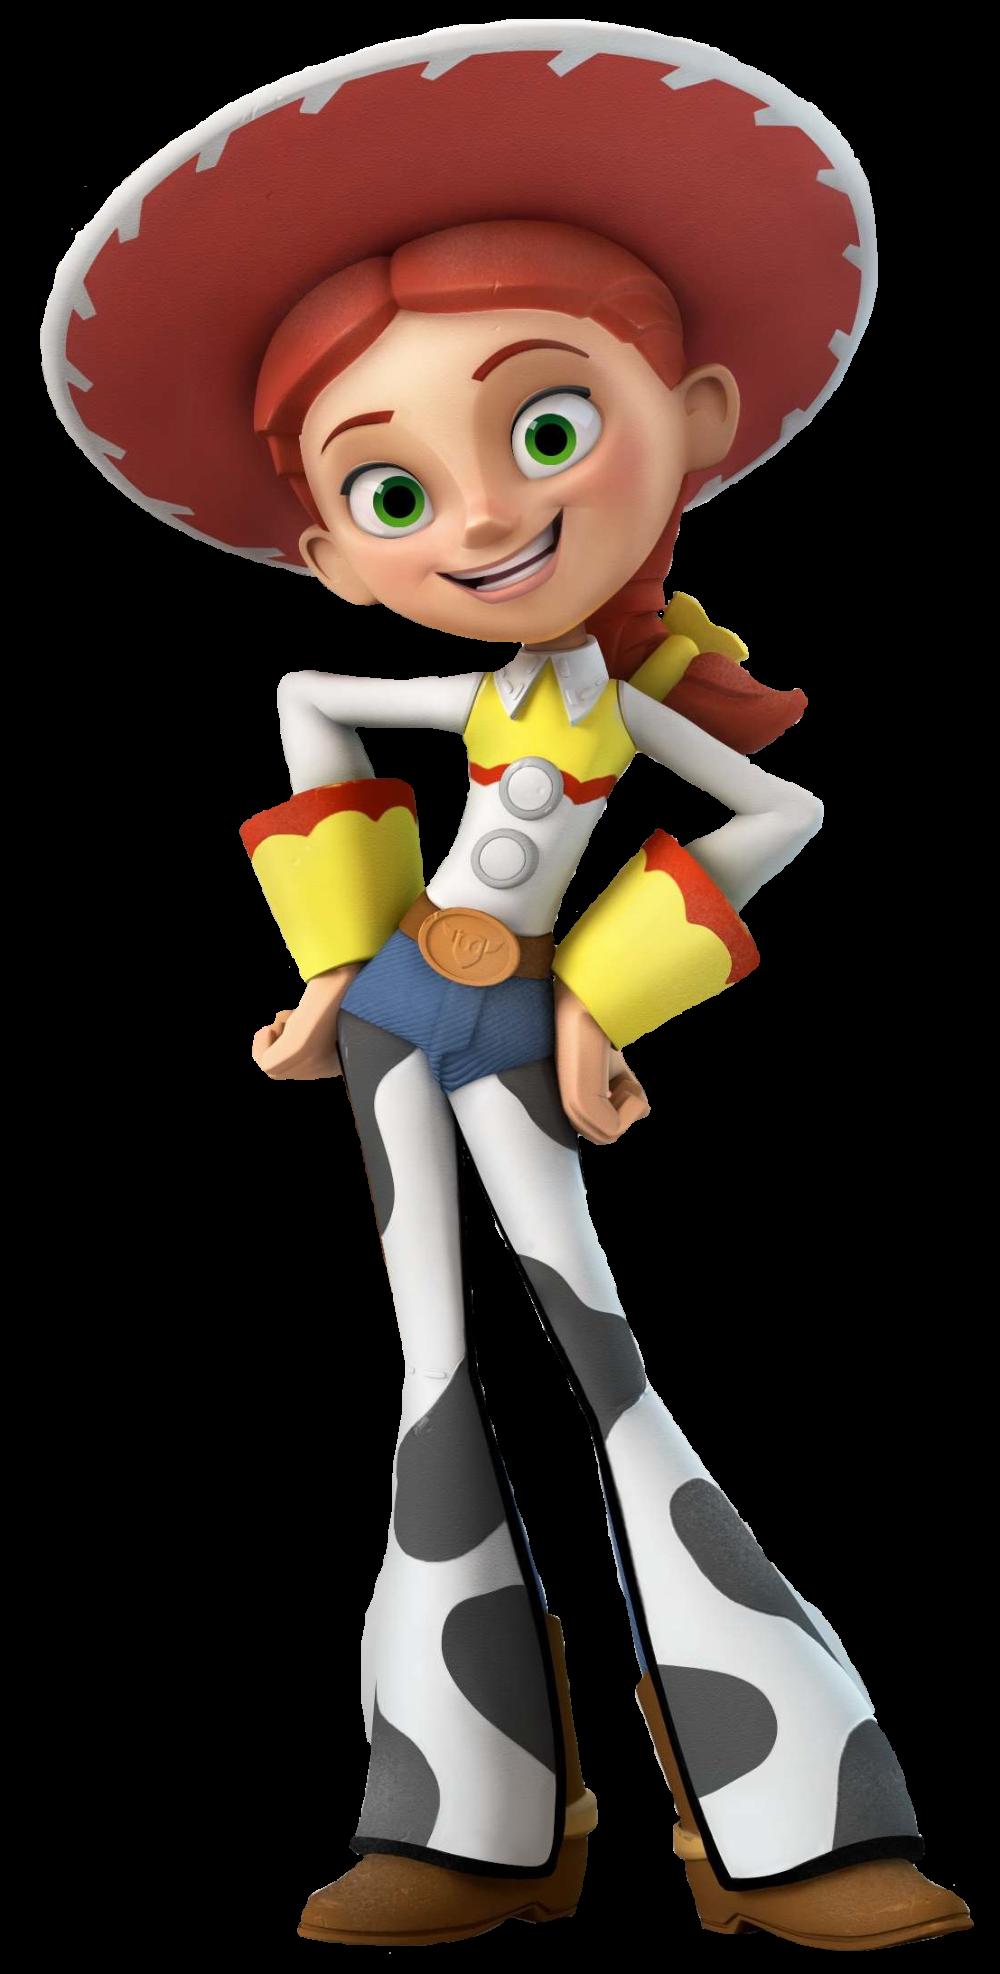 Disney Pixar Toy Story 4 Toy Story Movie New Disney Movies Toy Story